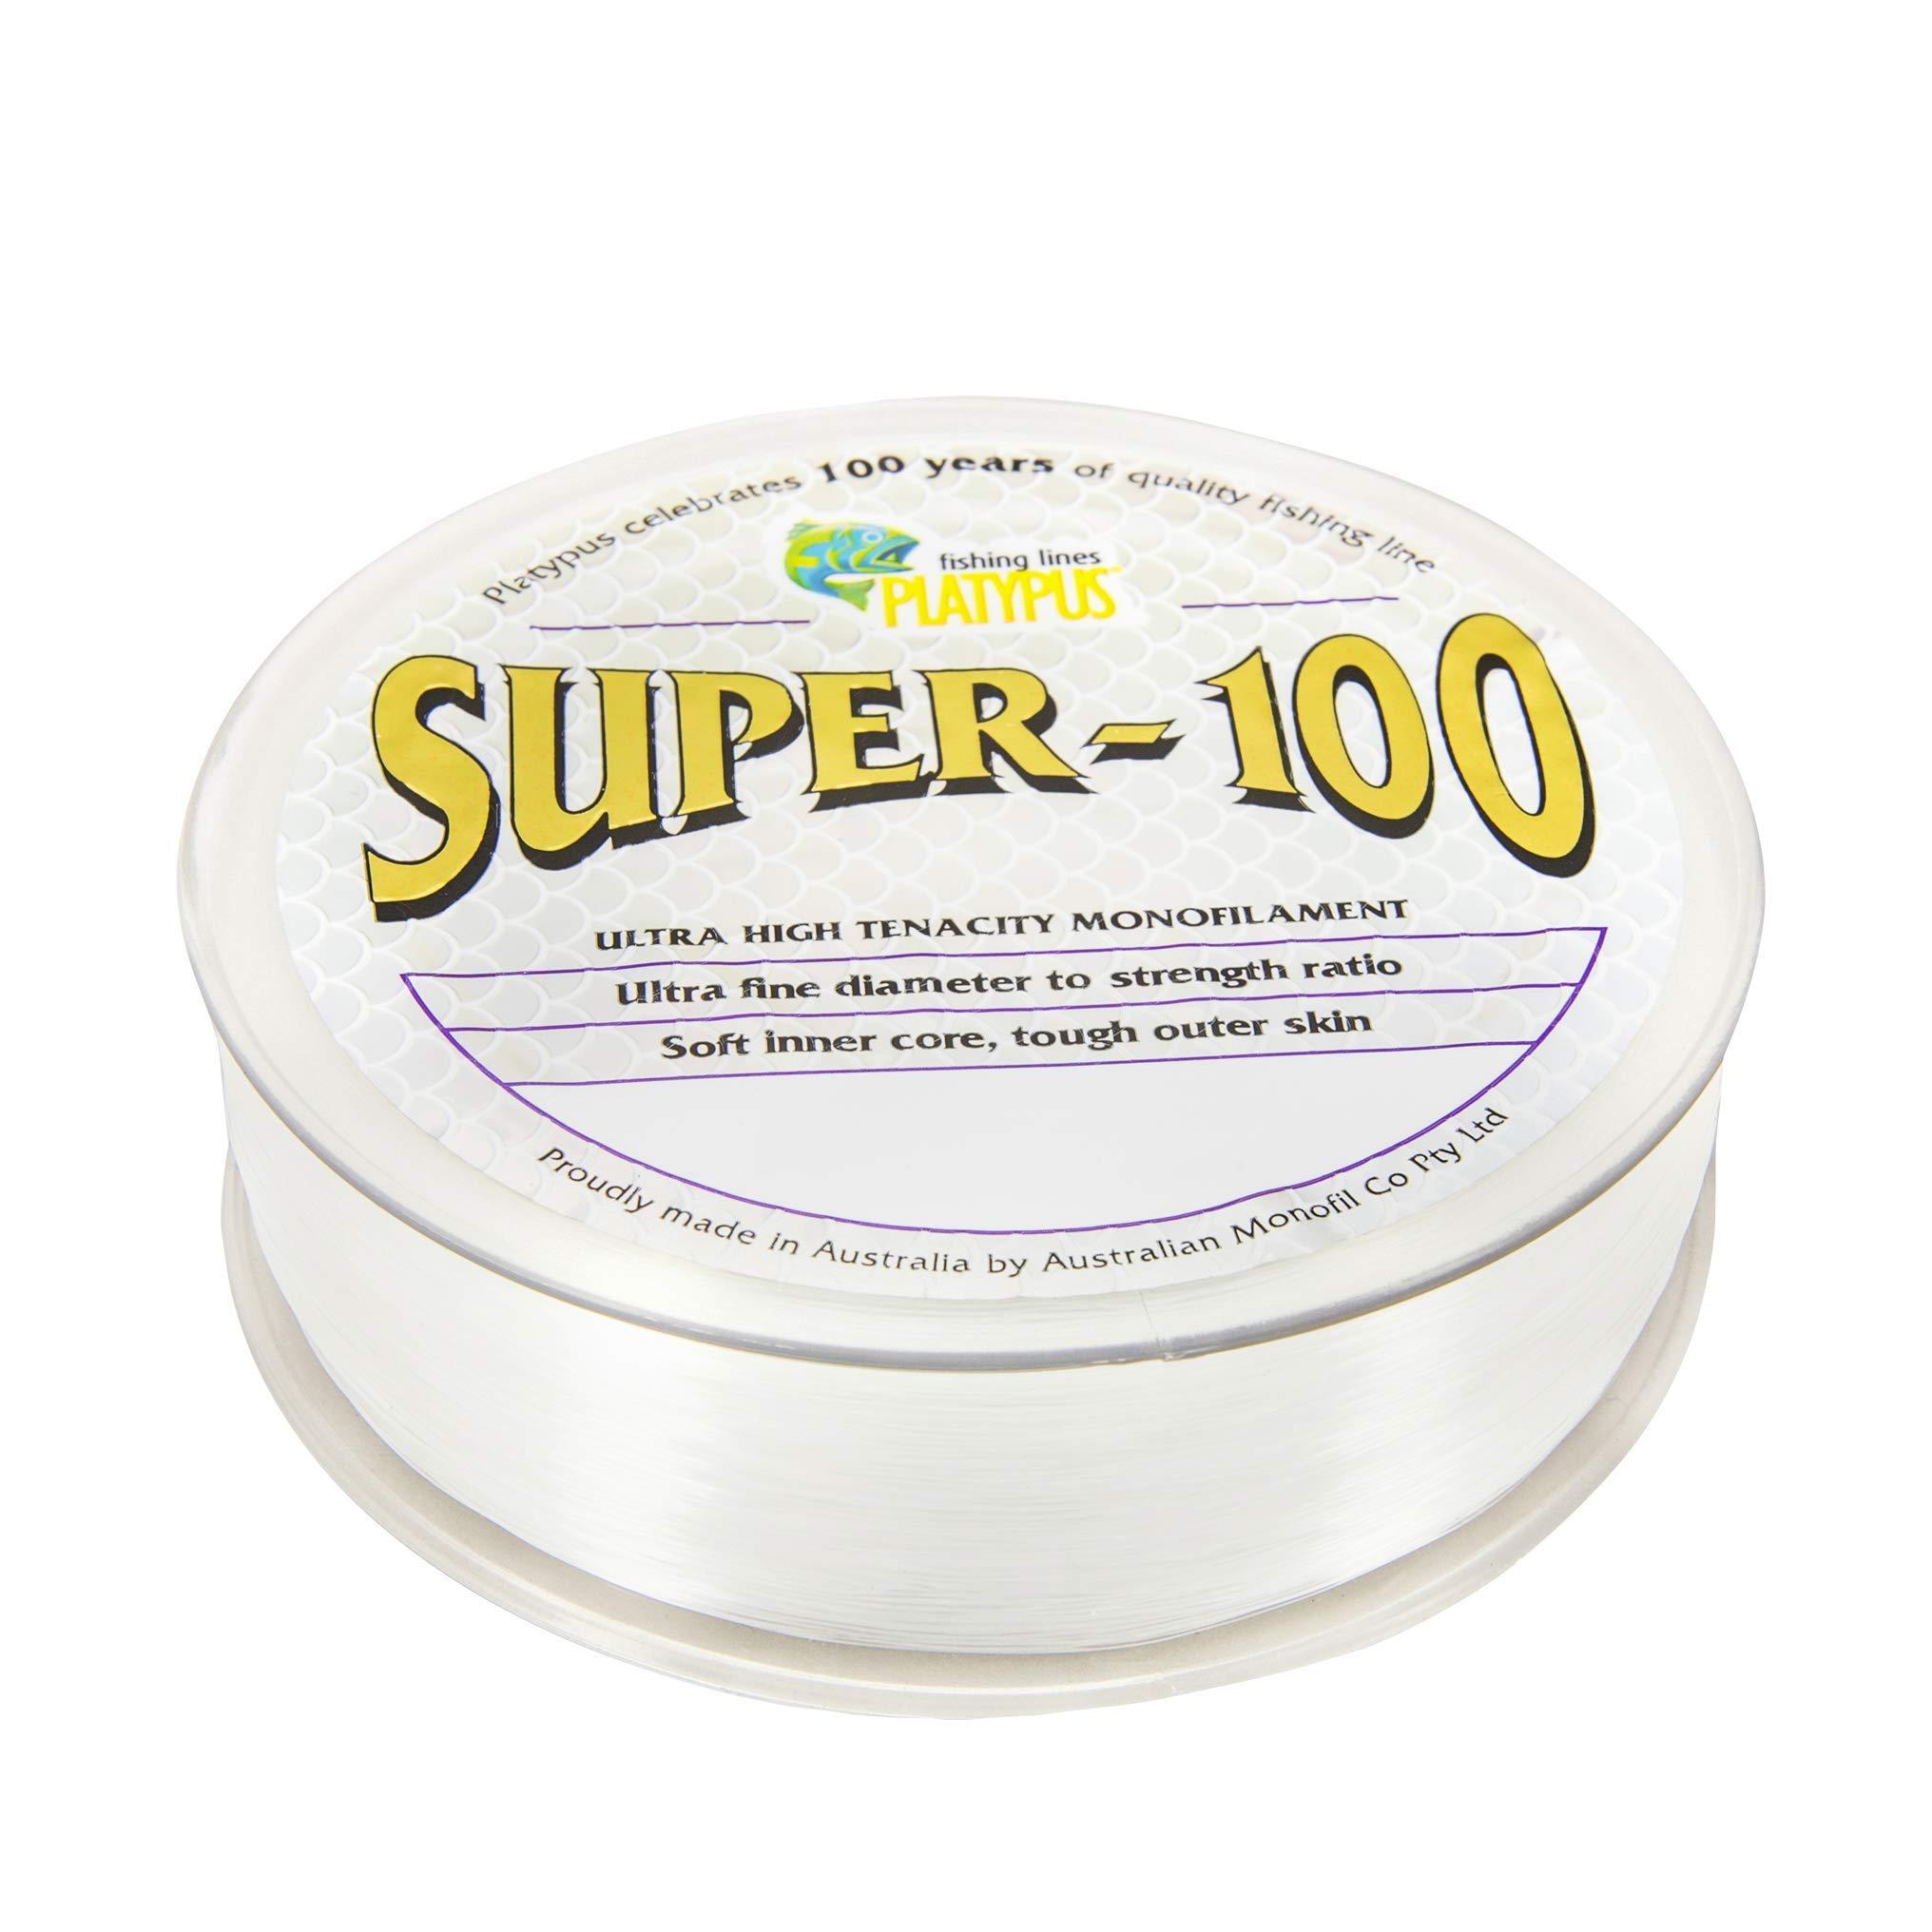 Platypus Super-100 - World's Strongest Fishing Line Since 1898! Clear (300m Spool, 50 lb)